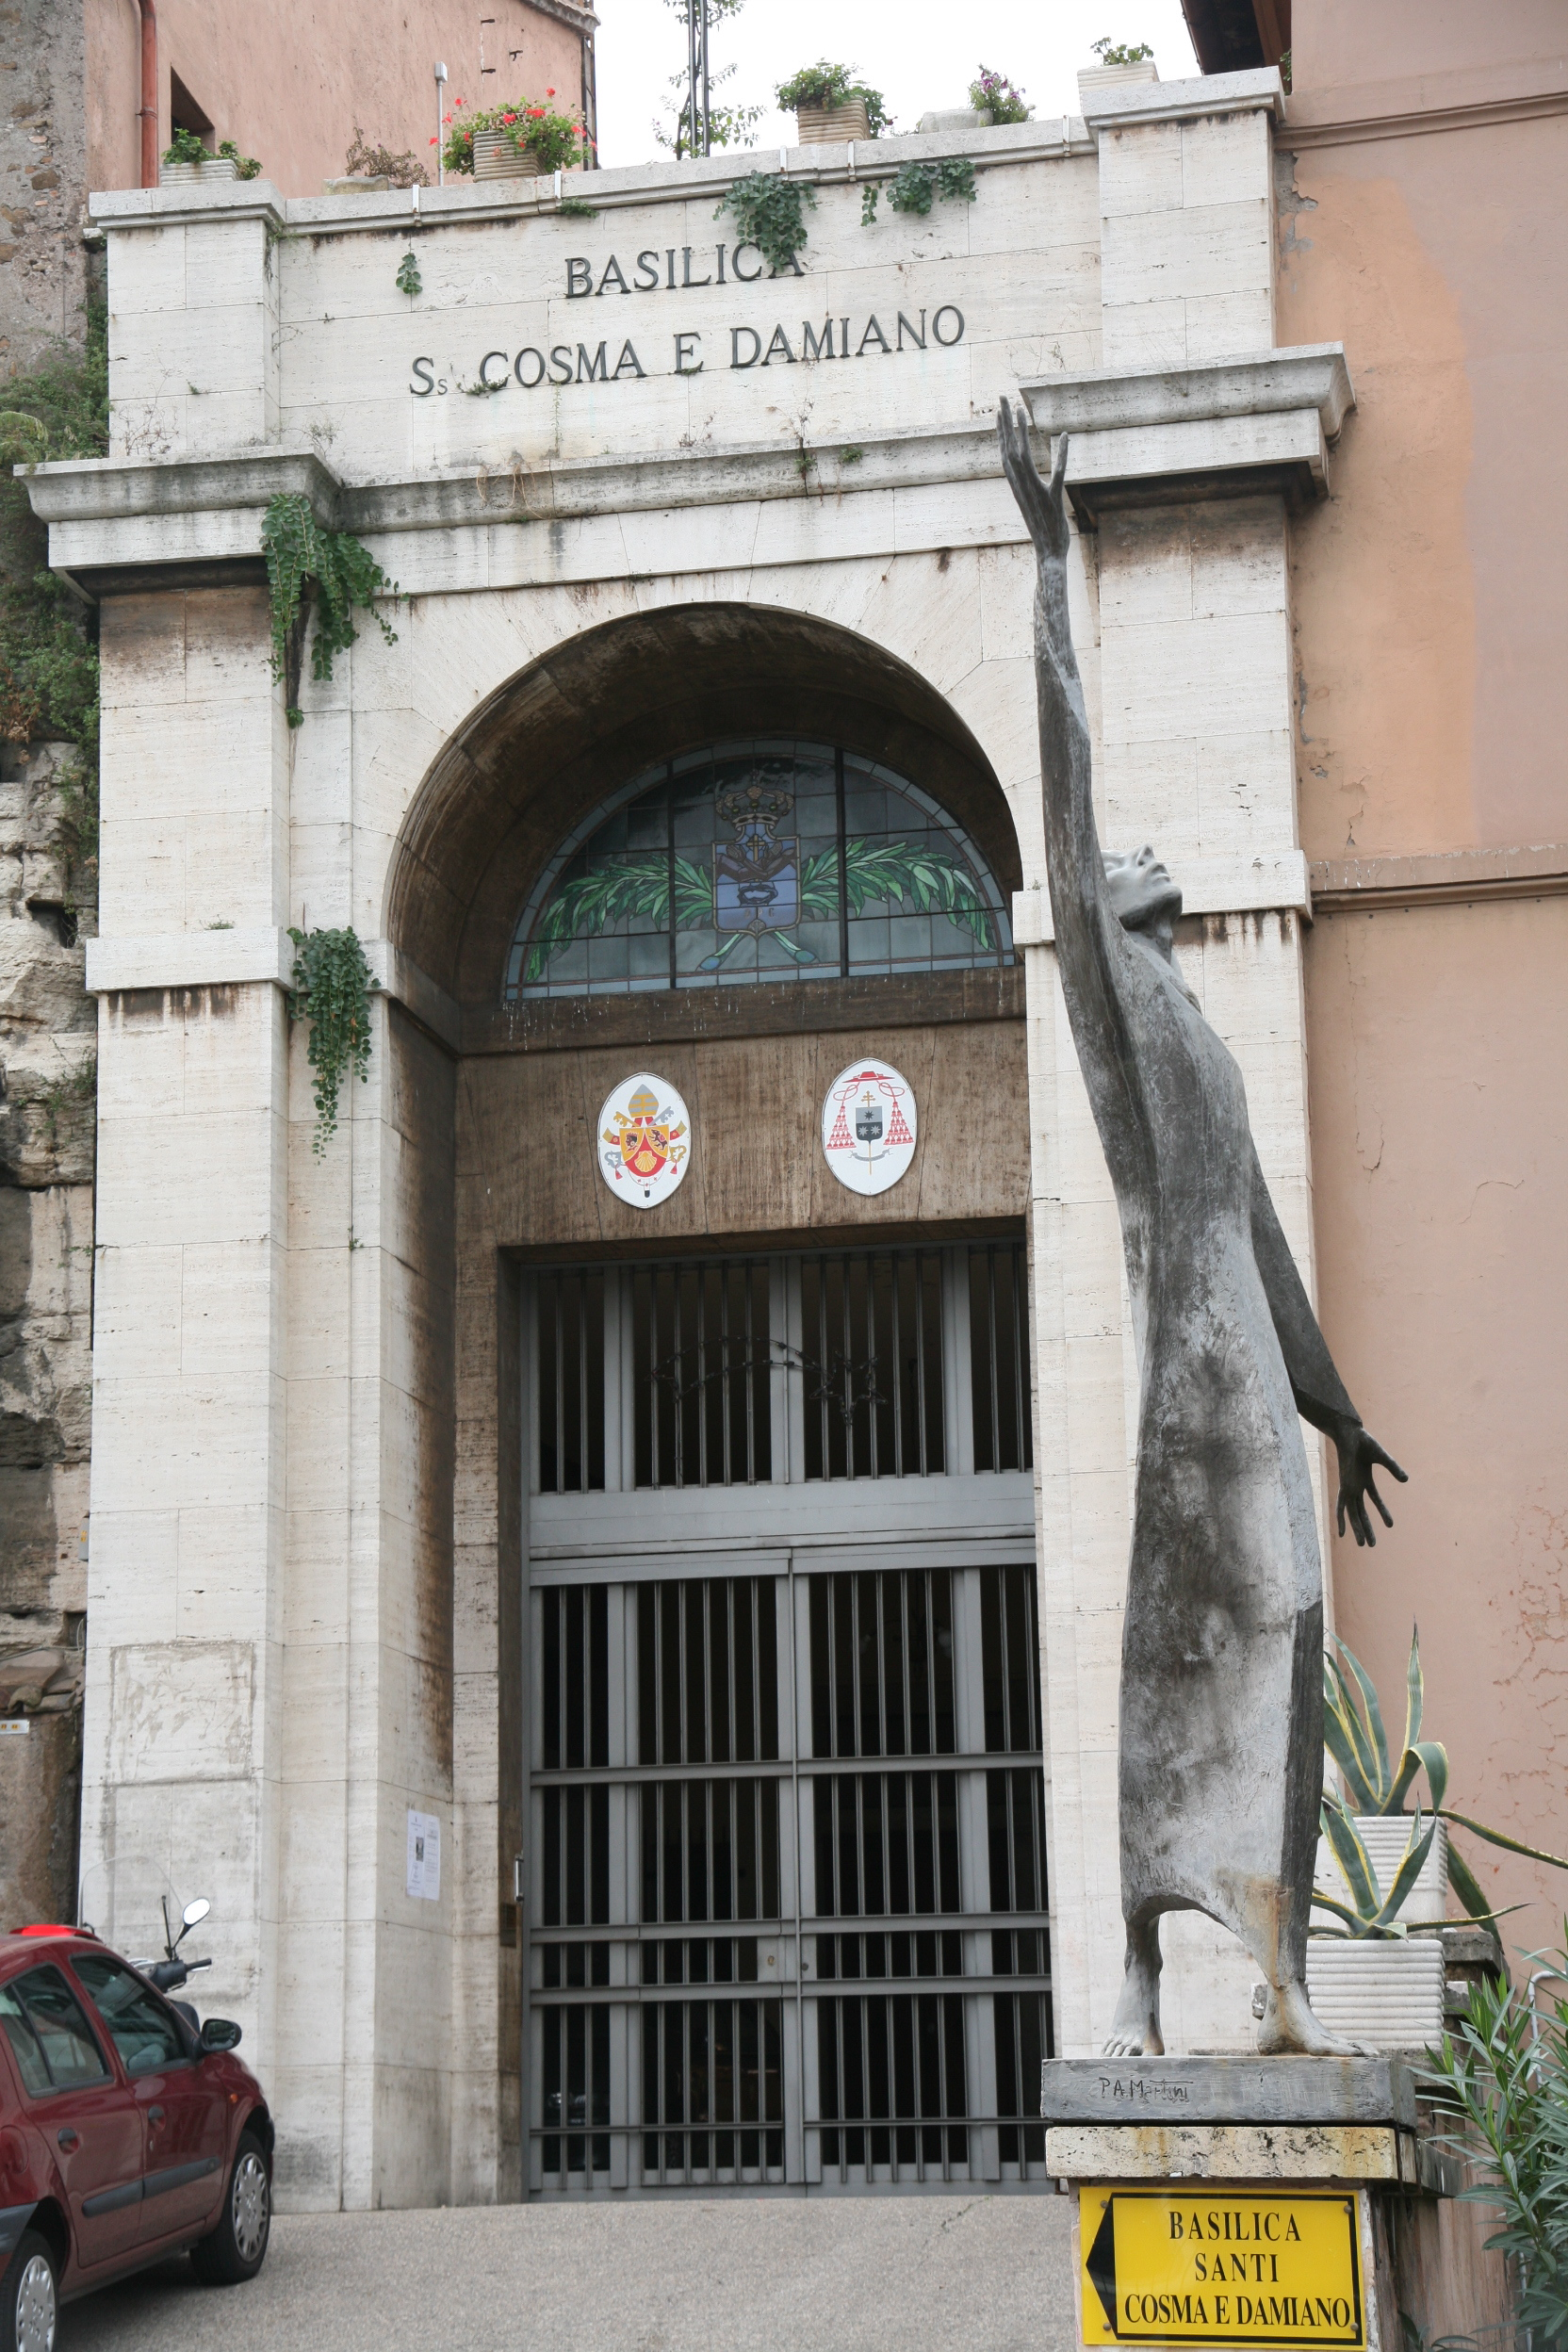 Santi Cosma e Damiano | Churches of Rome Wiki | FANDOM powered by Wikia